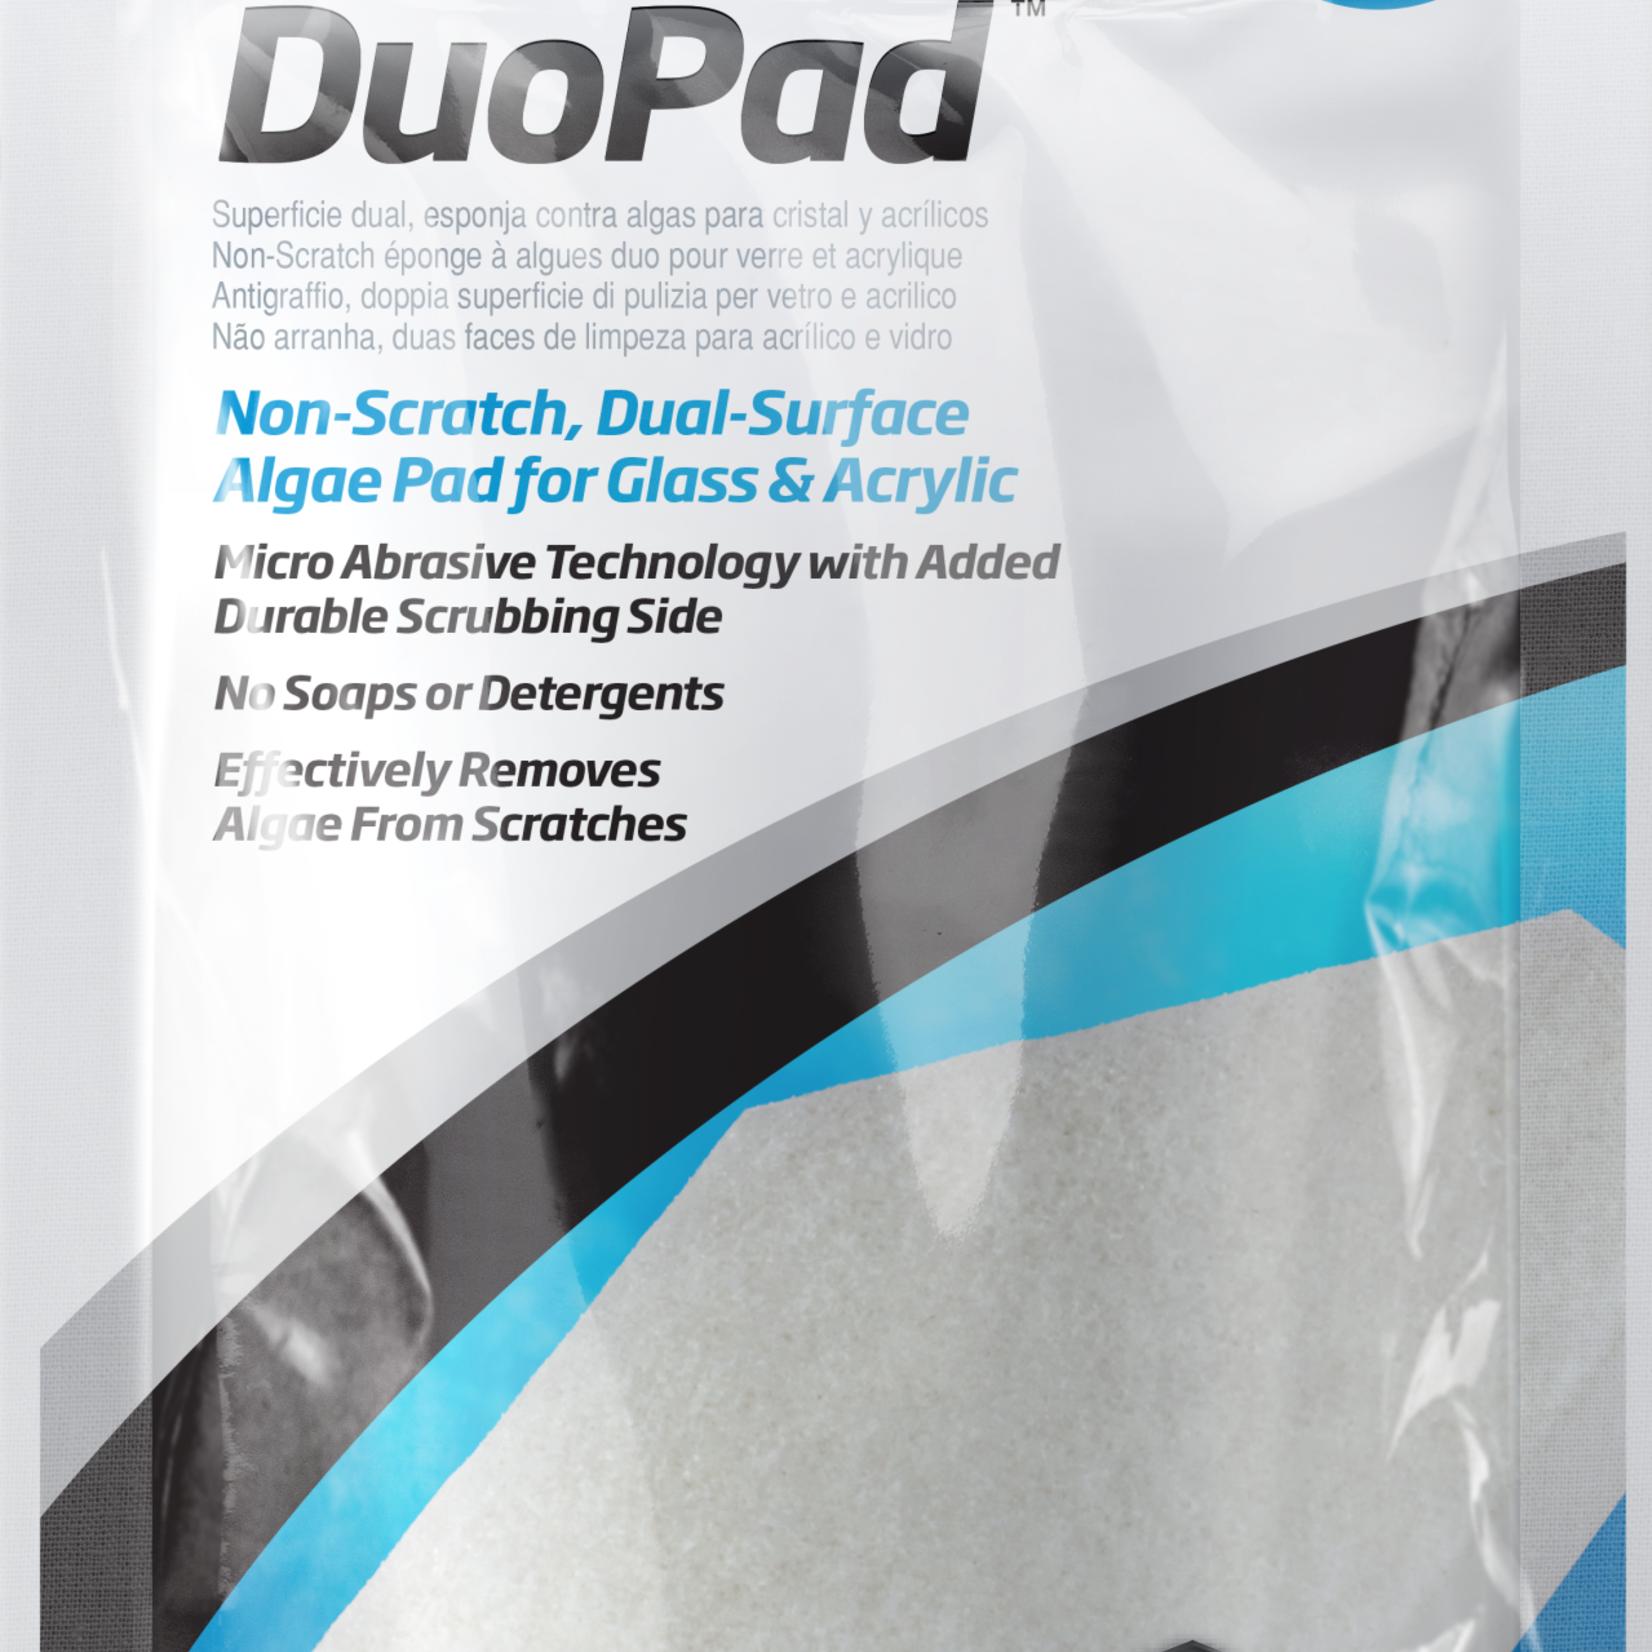 Seachem Duo Pad  25 mm